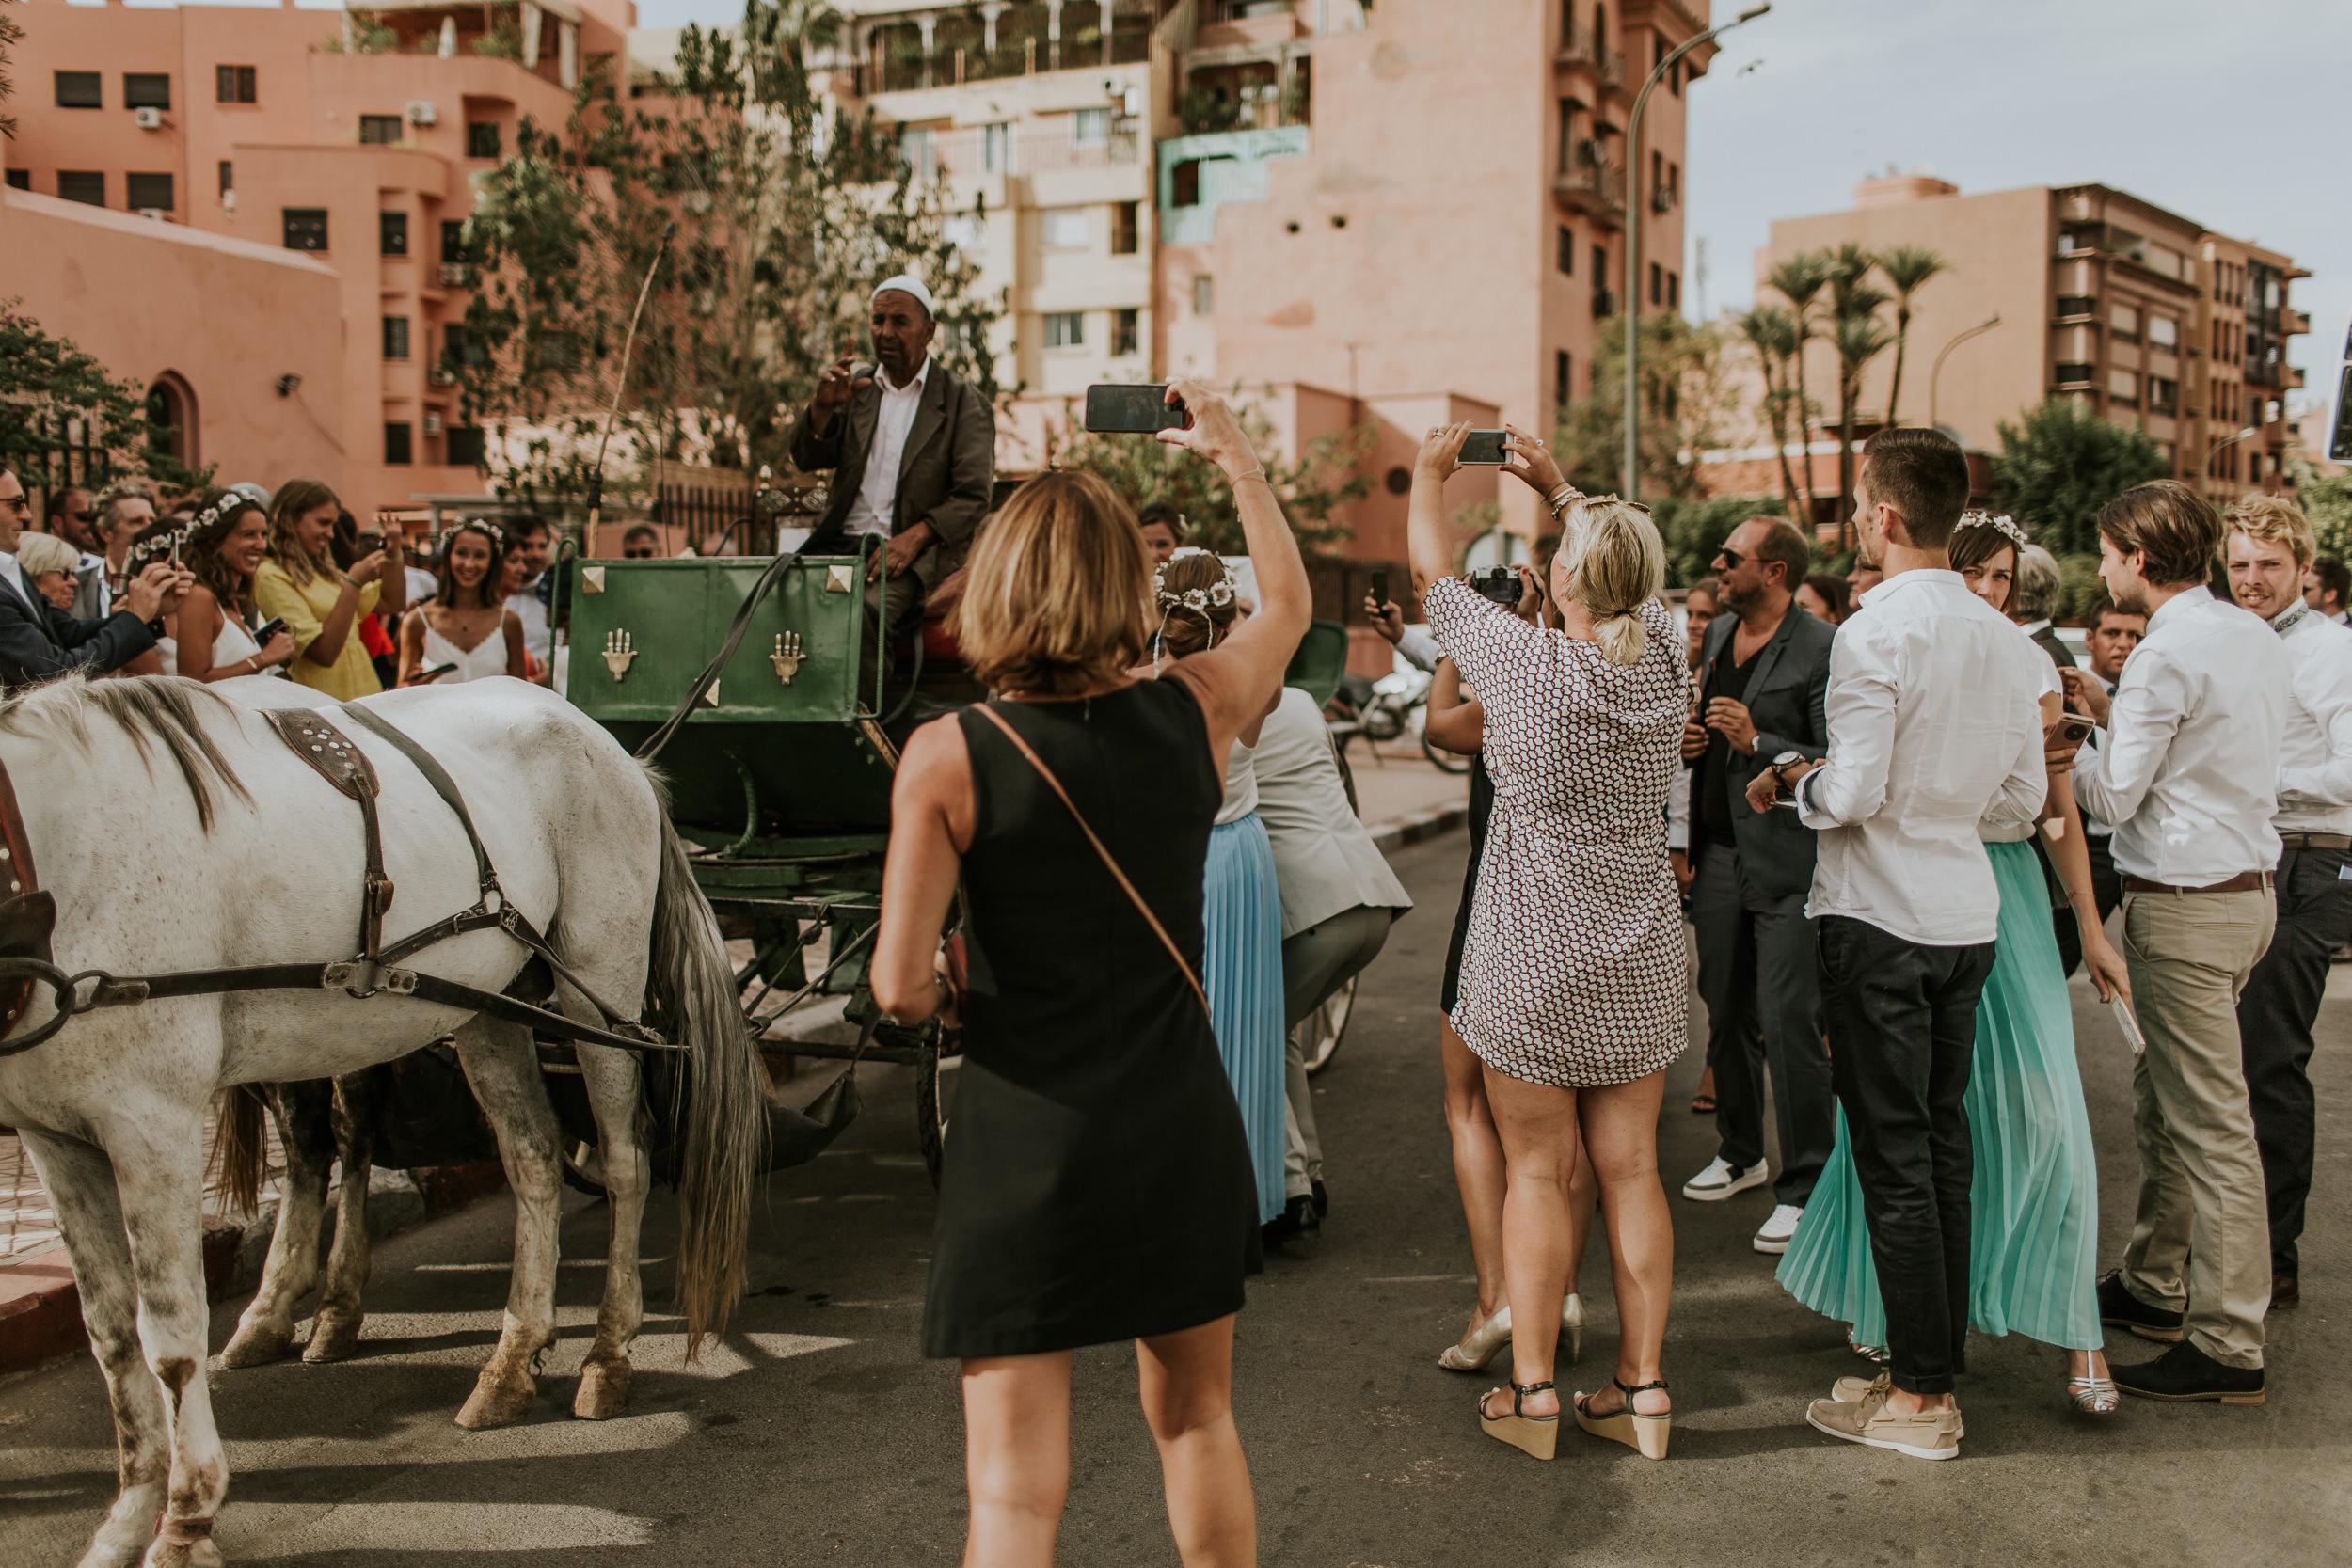 morganedimitri_davidmaire_marrakech_destinationwedding-178.jpg